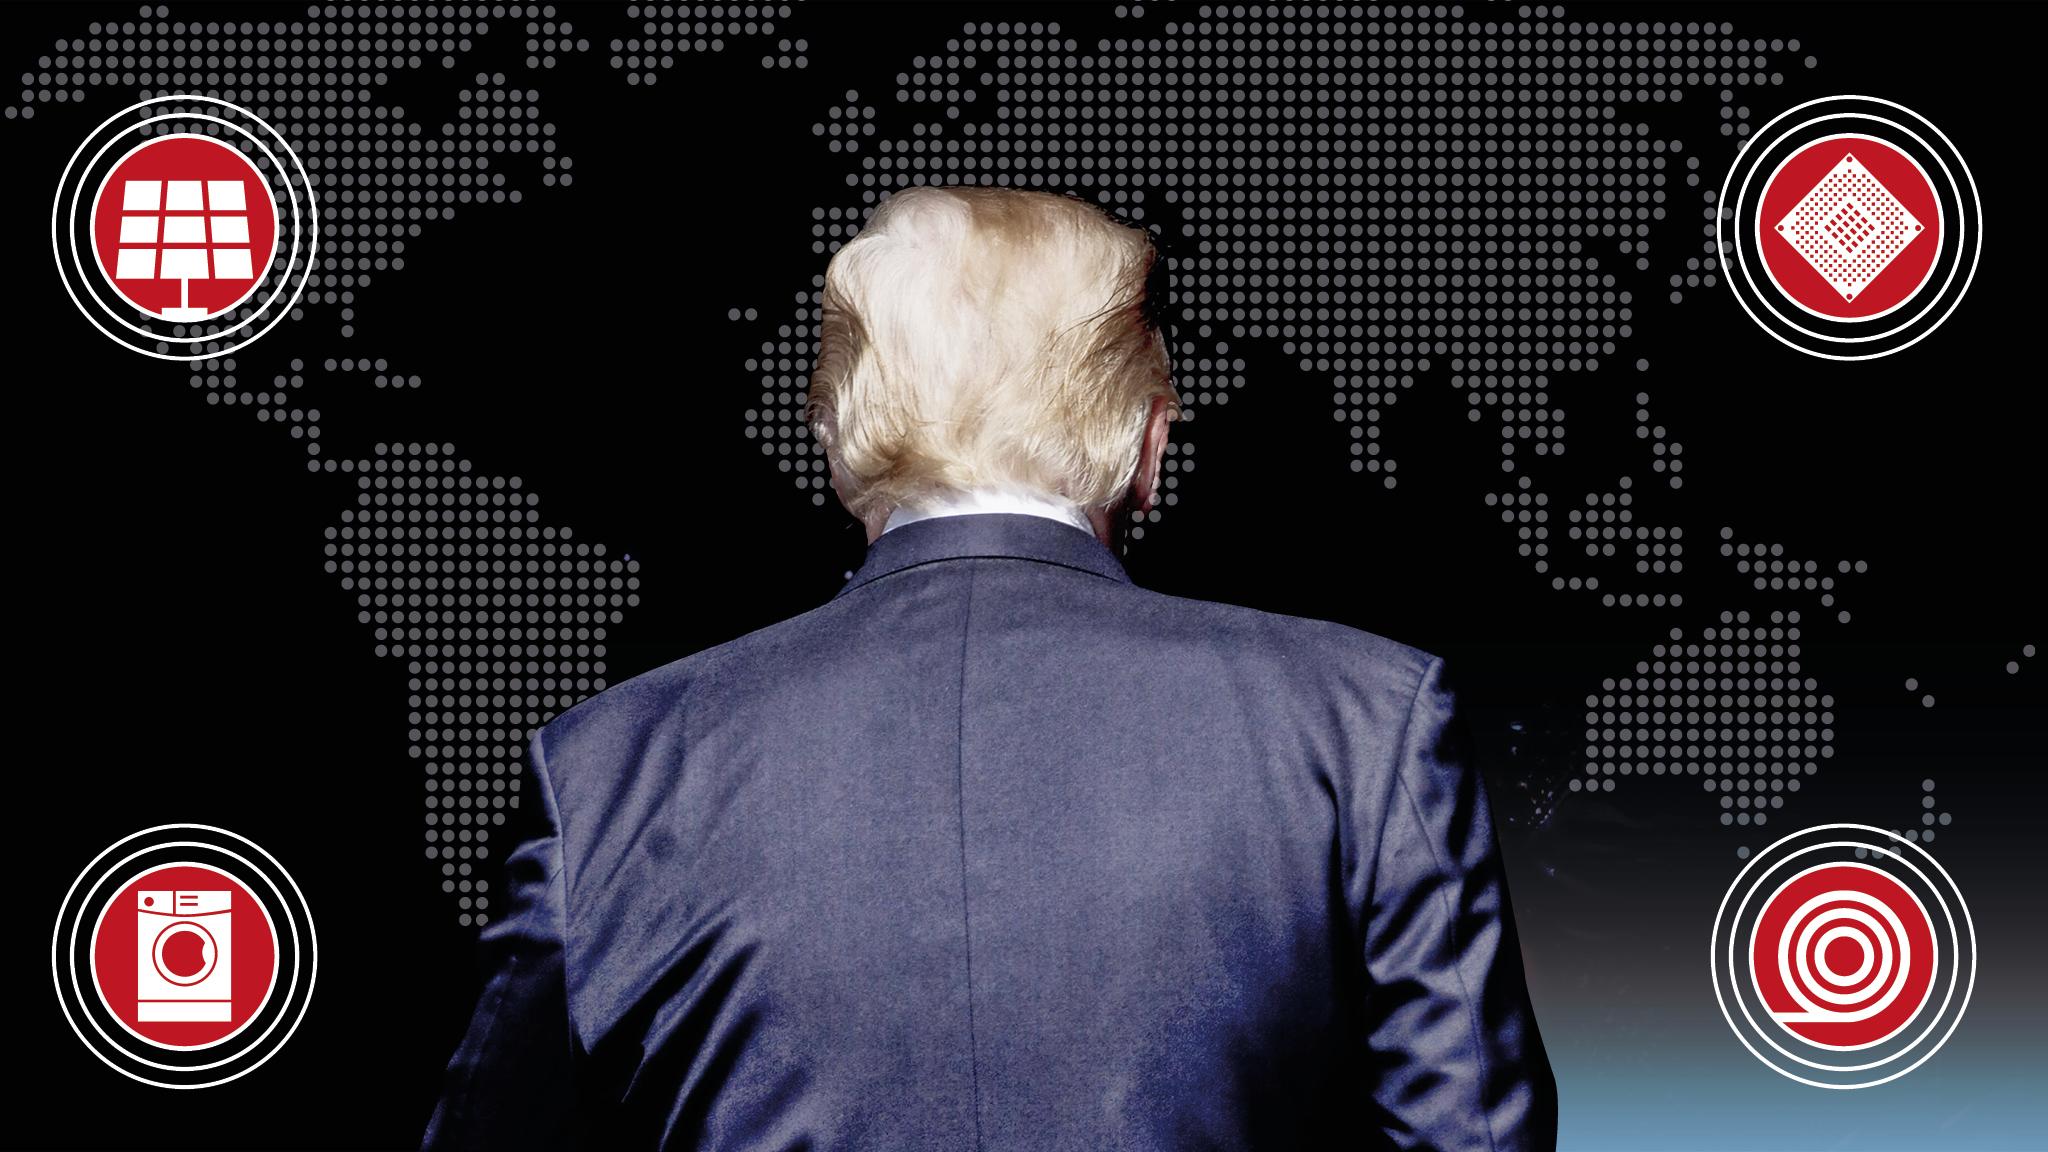 Trump agenda: has the president got America's back on trade?